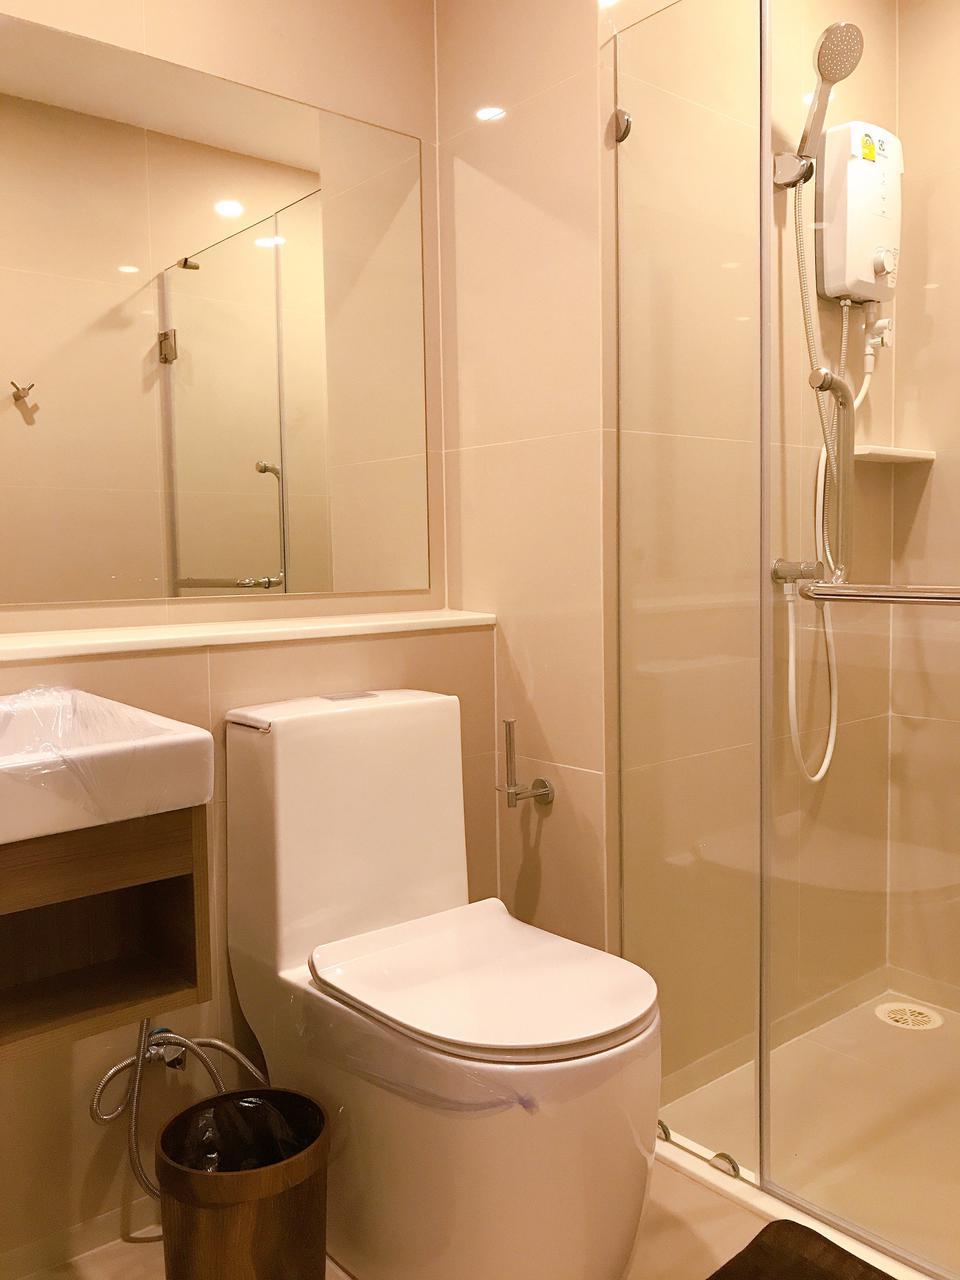 Fully furnished For rent ให้เช่า ฿12,000 ห้อง 25 ตร.ม. 8F ใหม่พร้อมอยู่ Aspire อโศก-รัชดา **รับ Agent รูปที่ 1